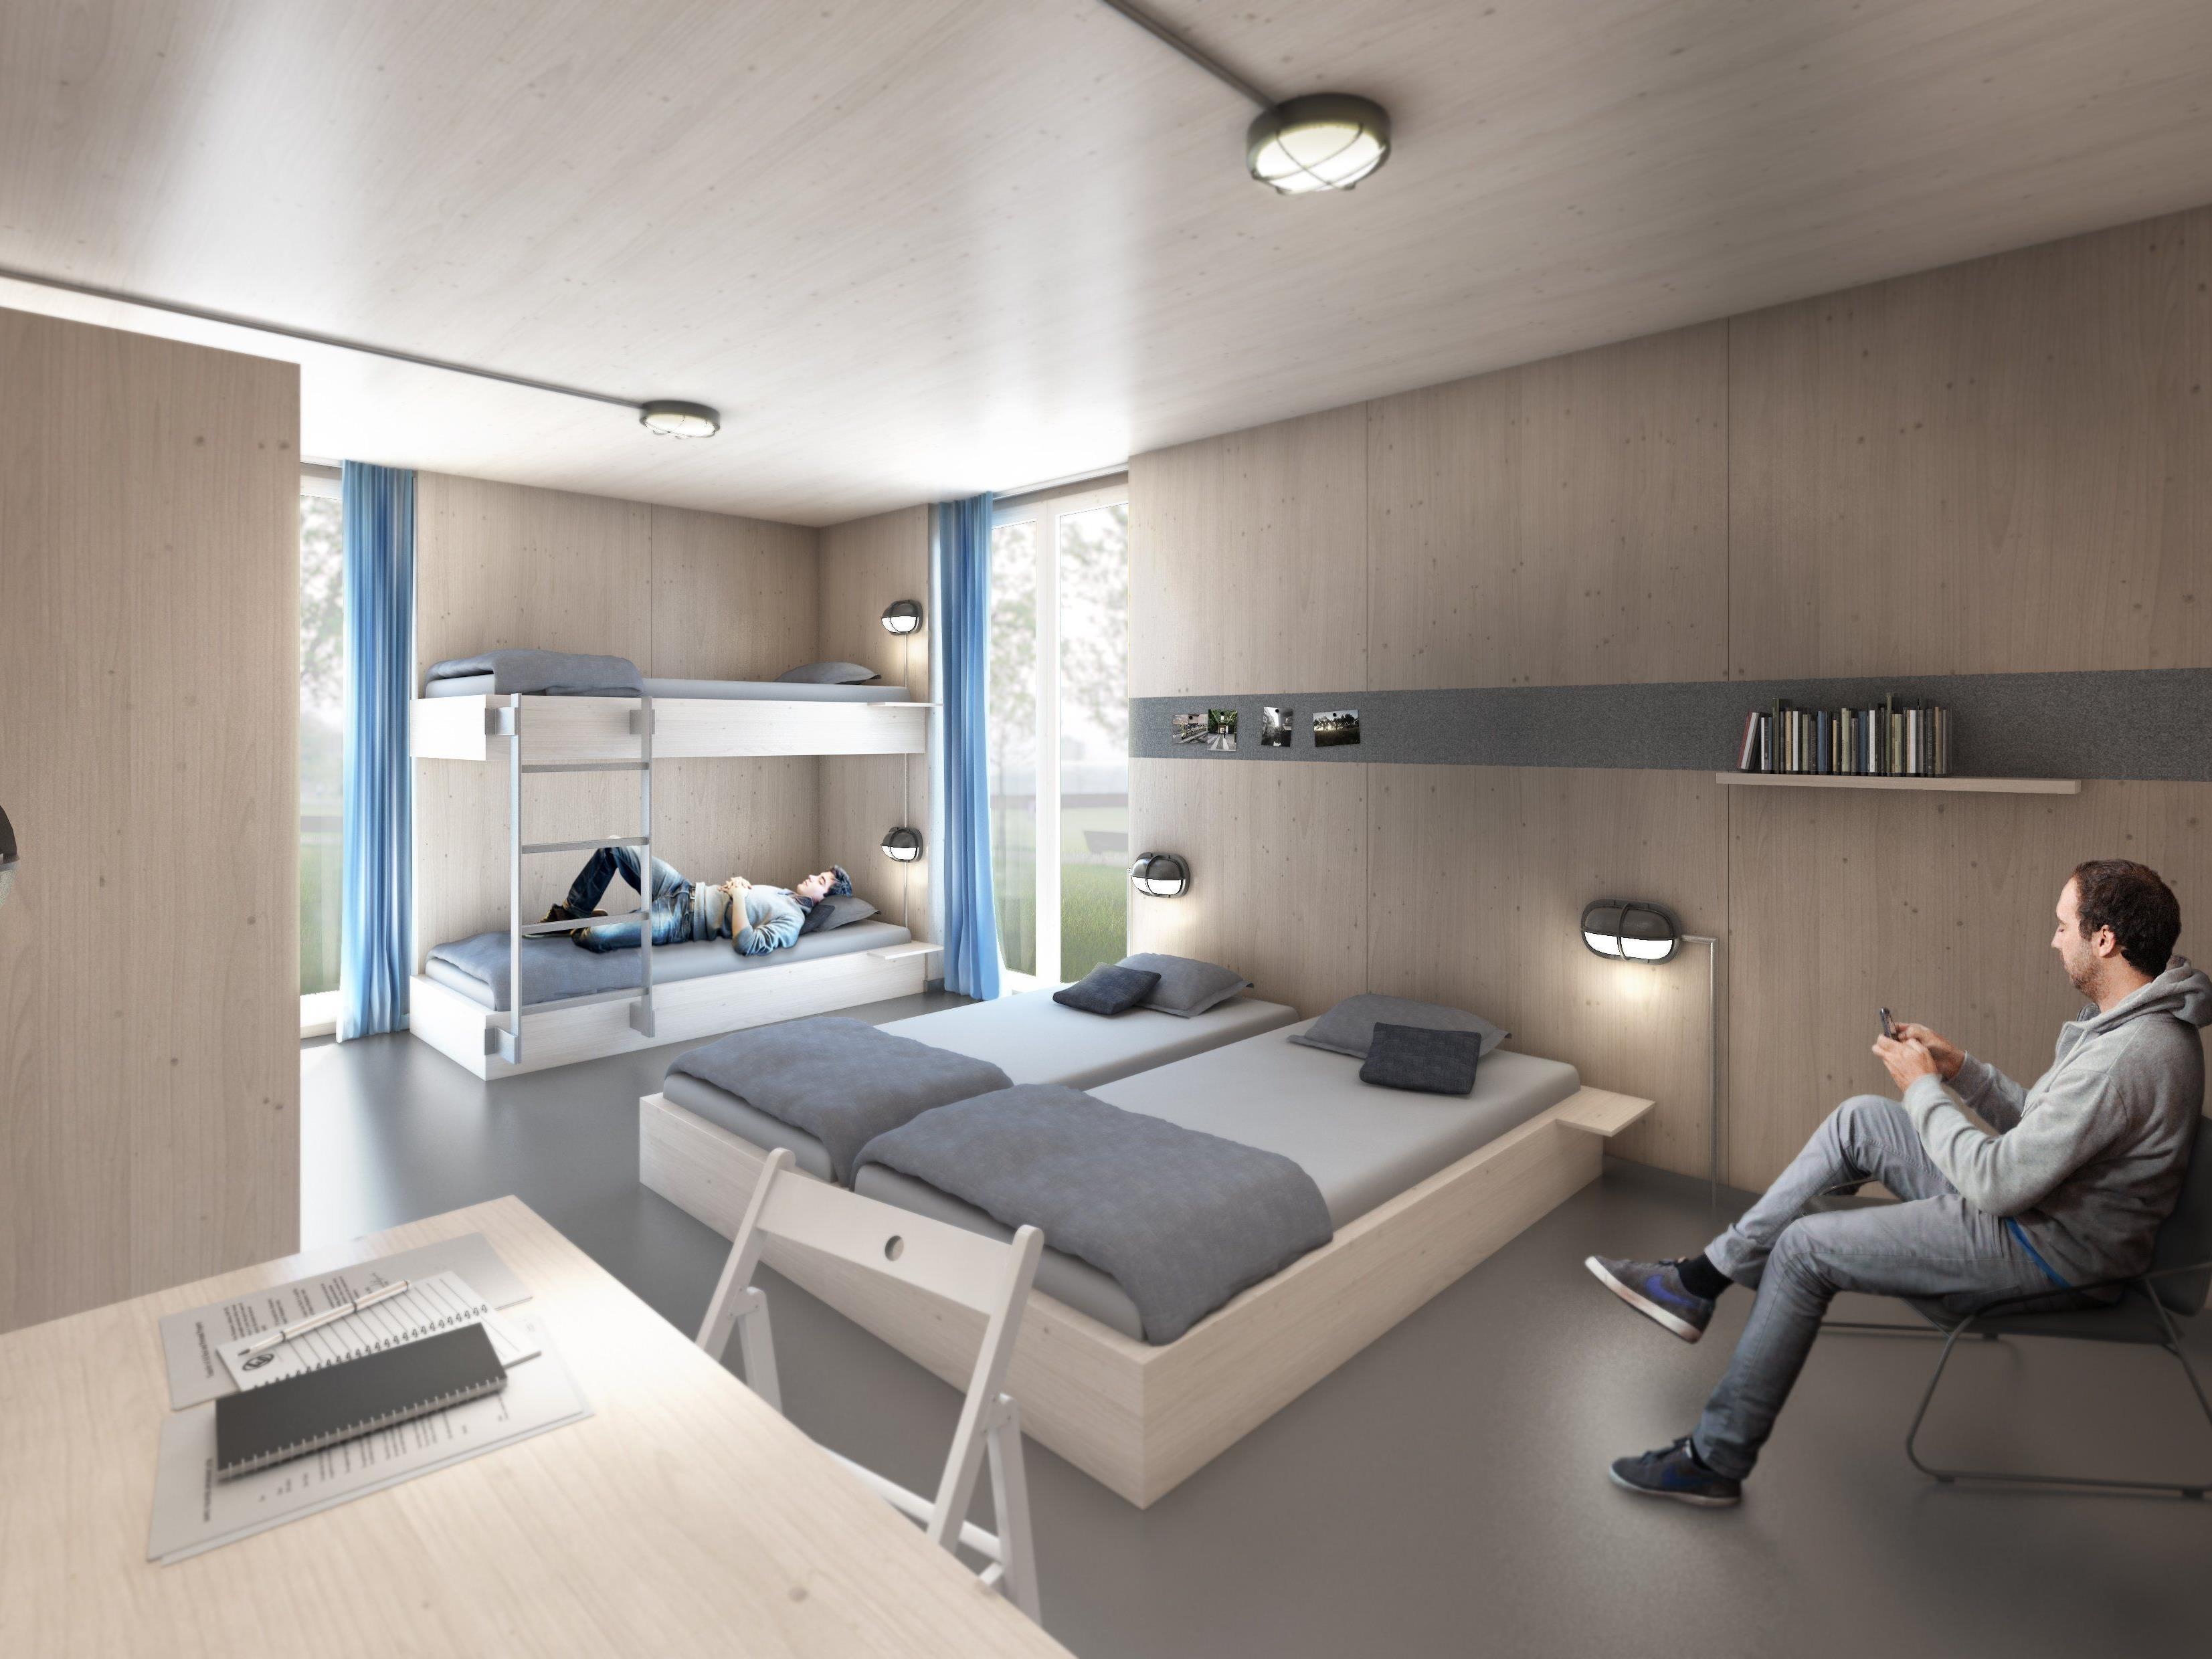 W lder bauen fl chtlingsheime aus holz in hannover for Wohncontainer aus holz